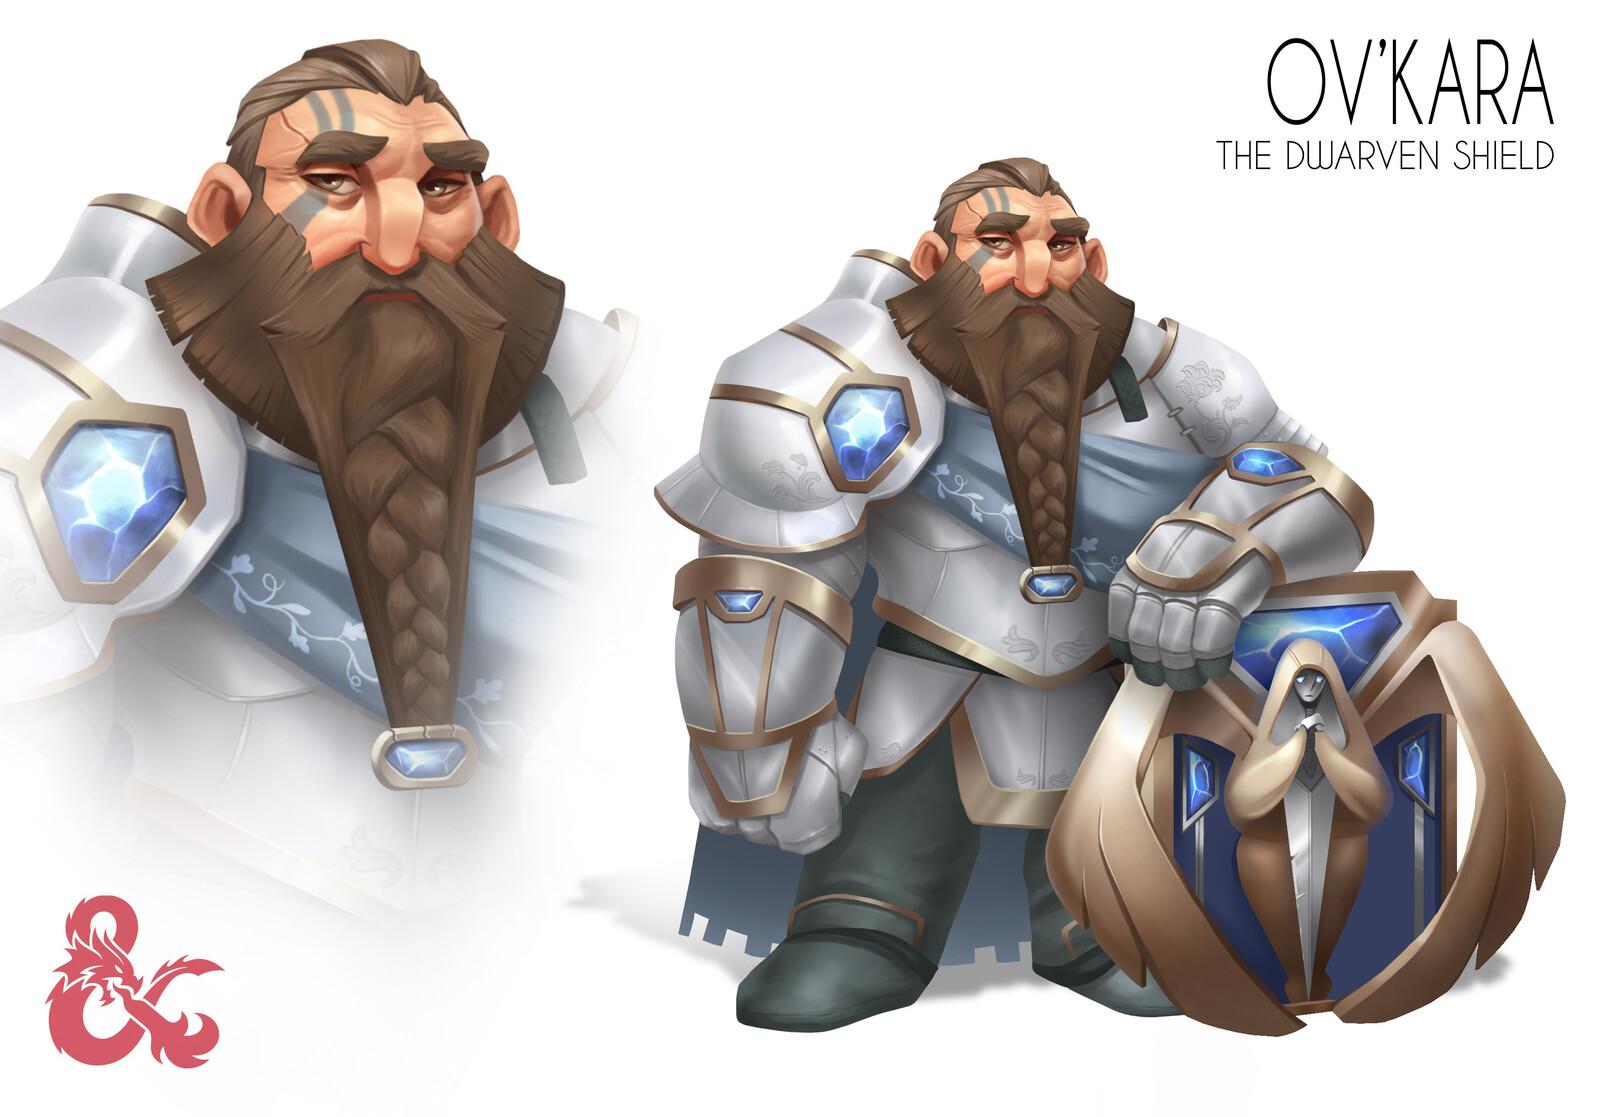 Ov'Kara, the Dwarven Shield